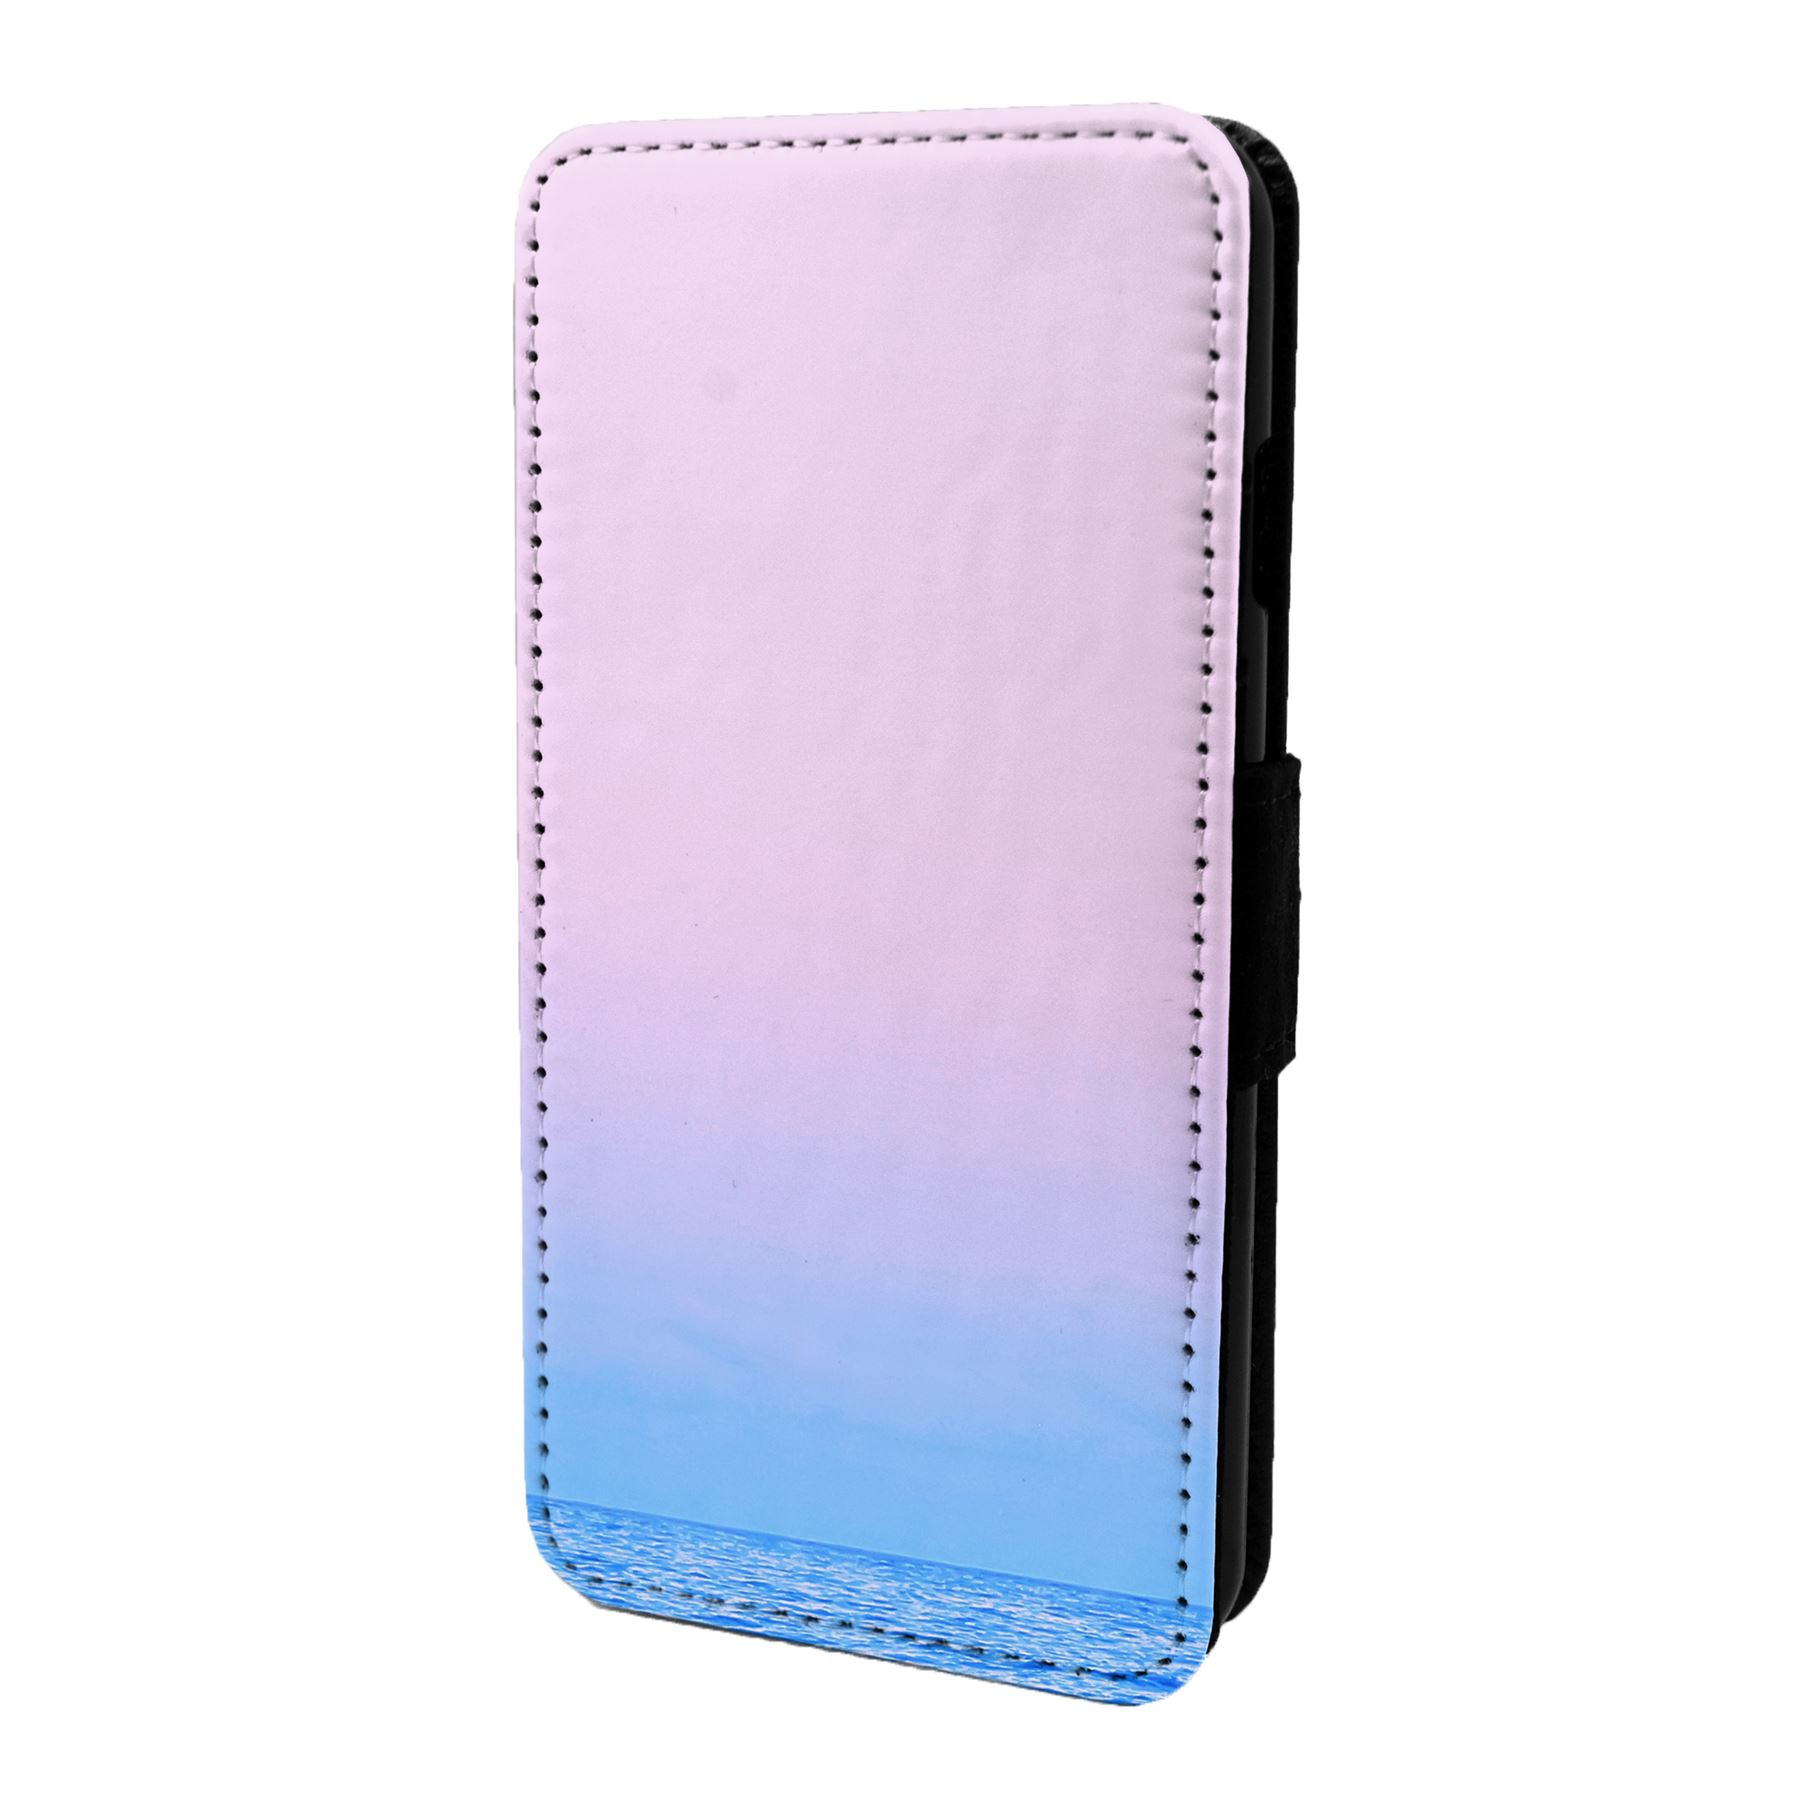 Pastel-Minimal-Mer-Imprime-Etui-Rabattable-pour-Telephone-Portable-S7028